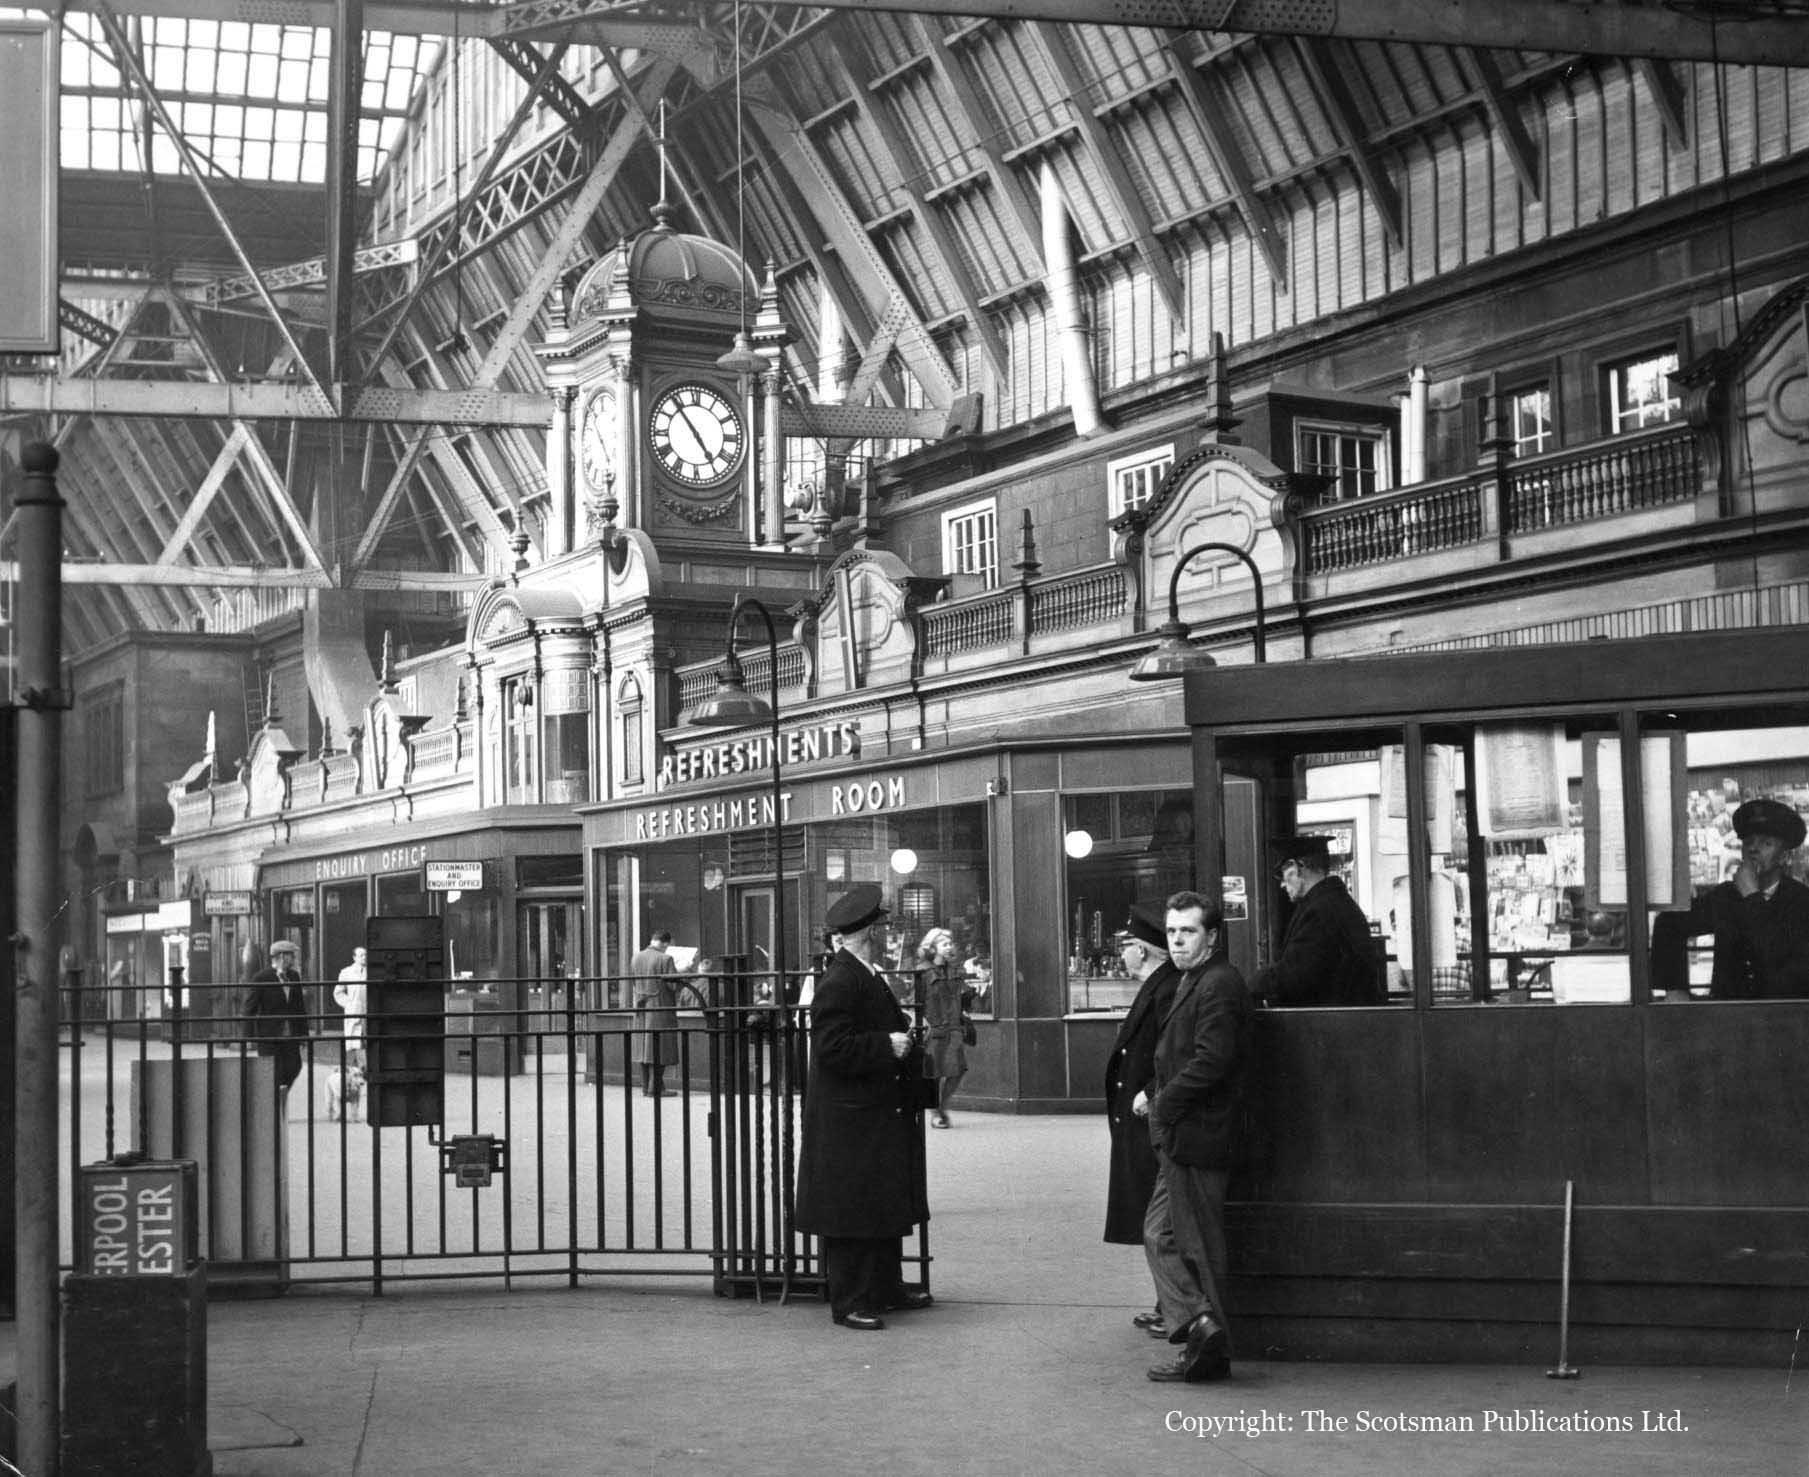 Caledonian Station aka Caley Station Princes Street Edinburgh in 1965.